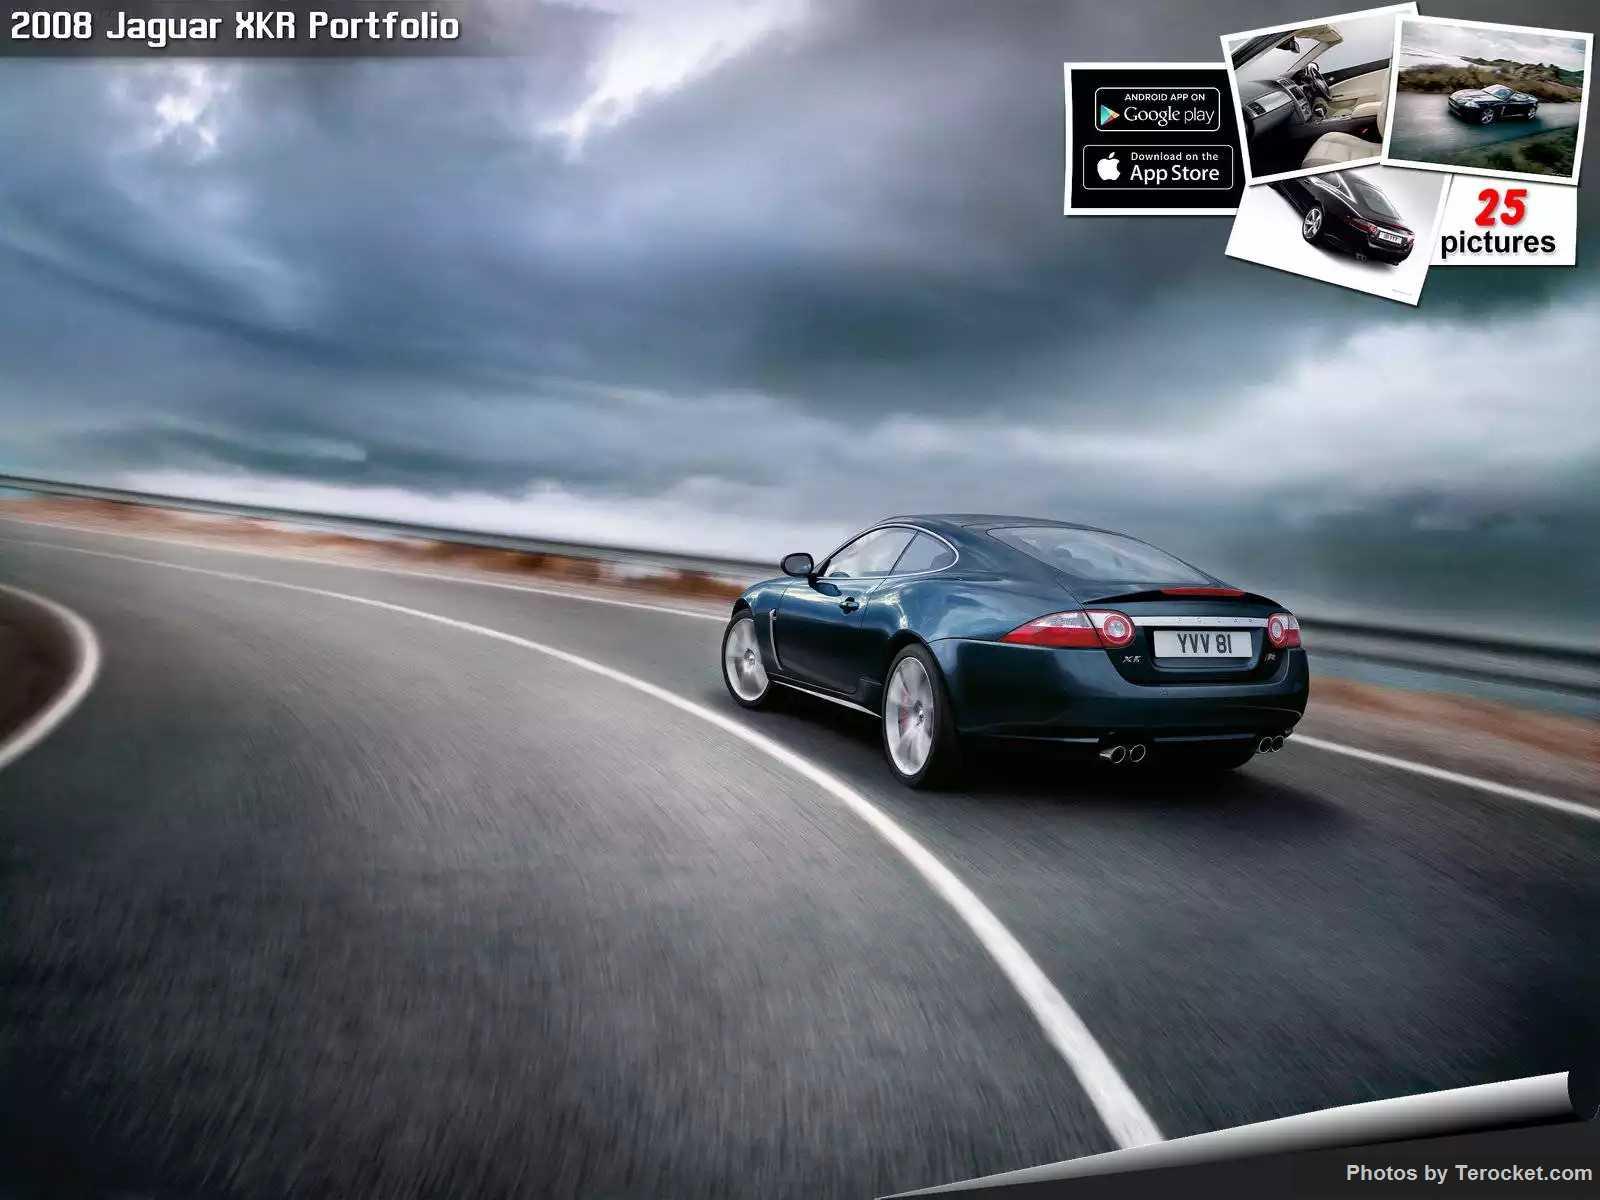 Hình ảnh xe ô tô Jaguar XKR Portfolio 2008 & nội ngoại thất